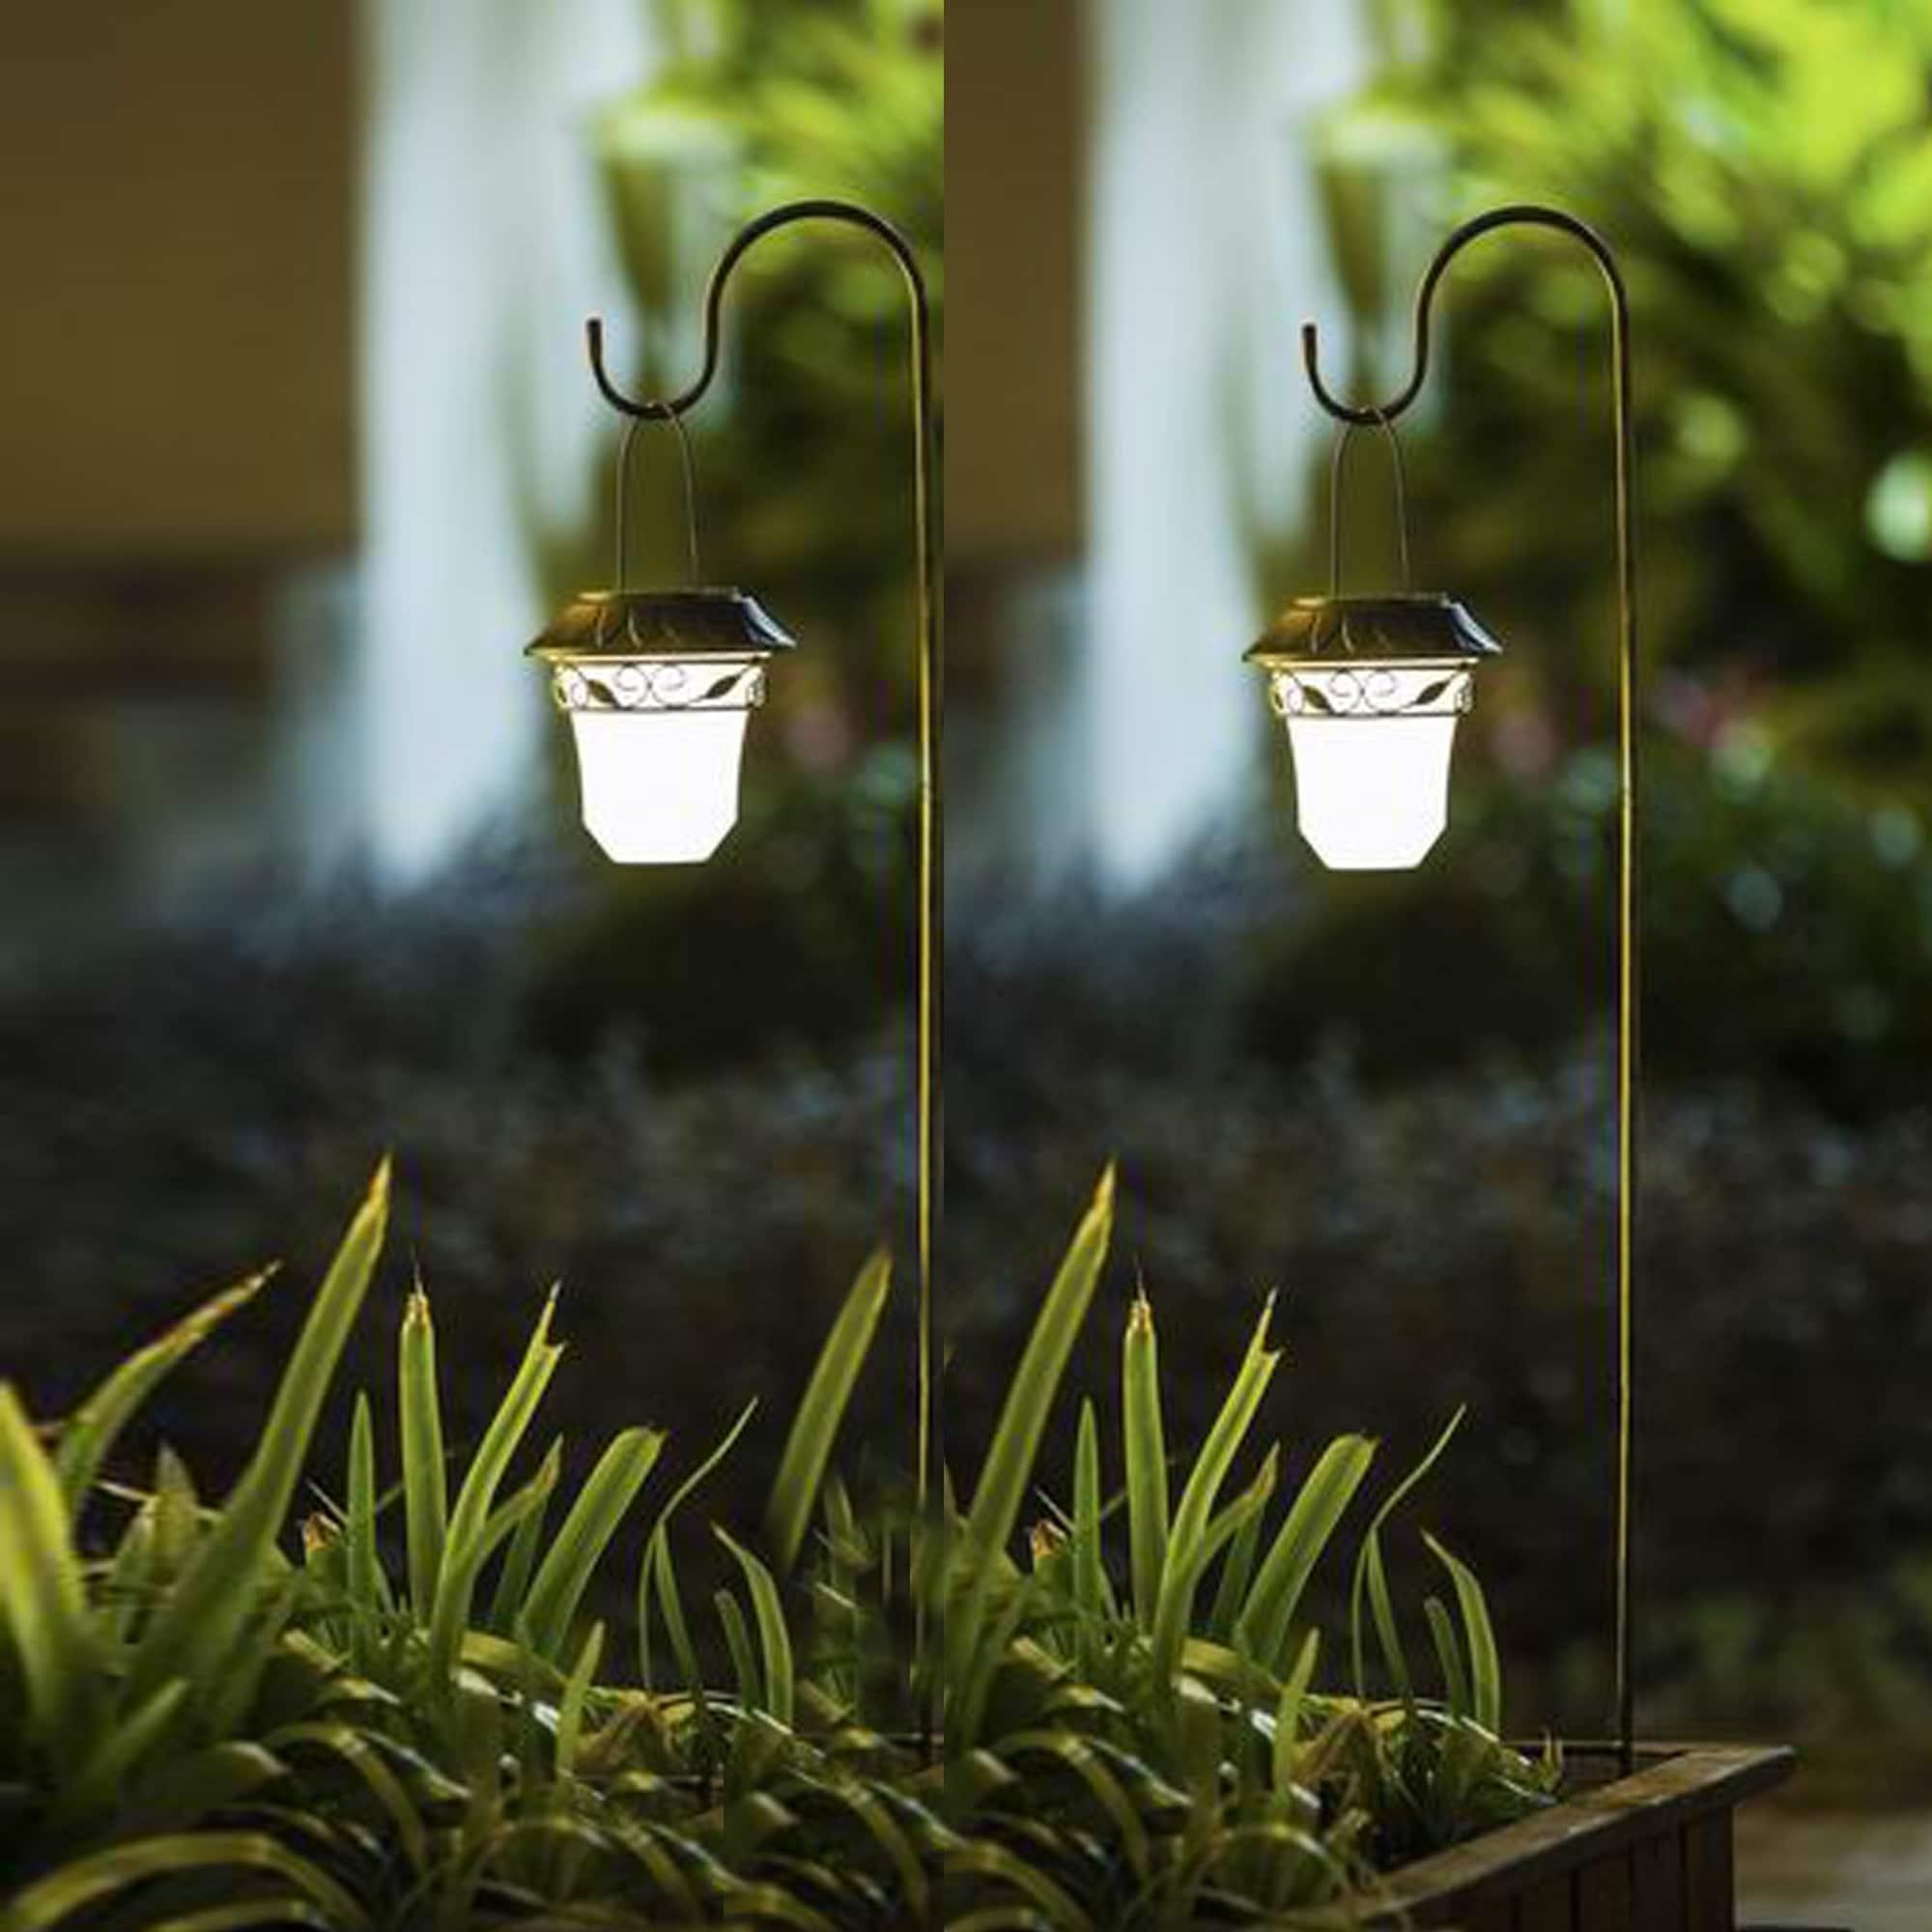 Set Of 2 Decorative Leaves Design Hanging Solar Lights With Shepherd S Hook